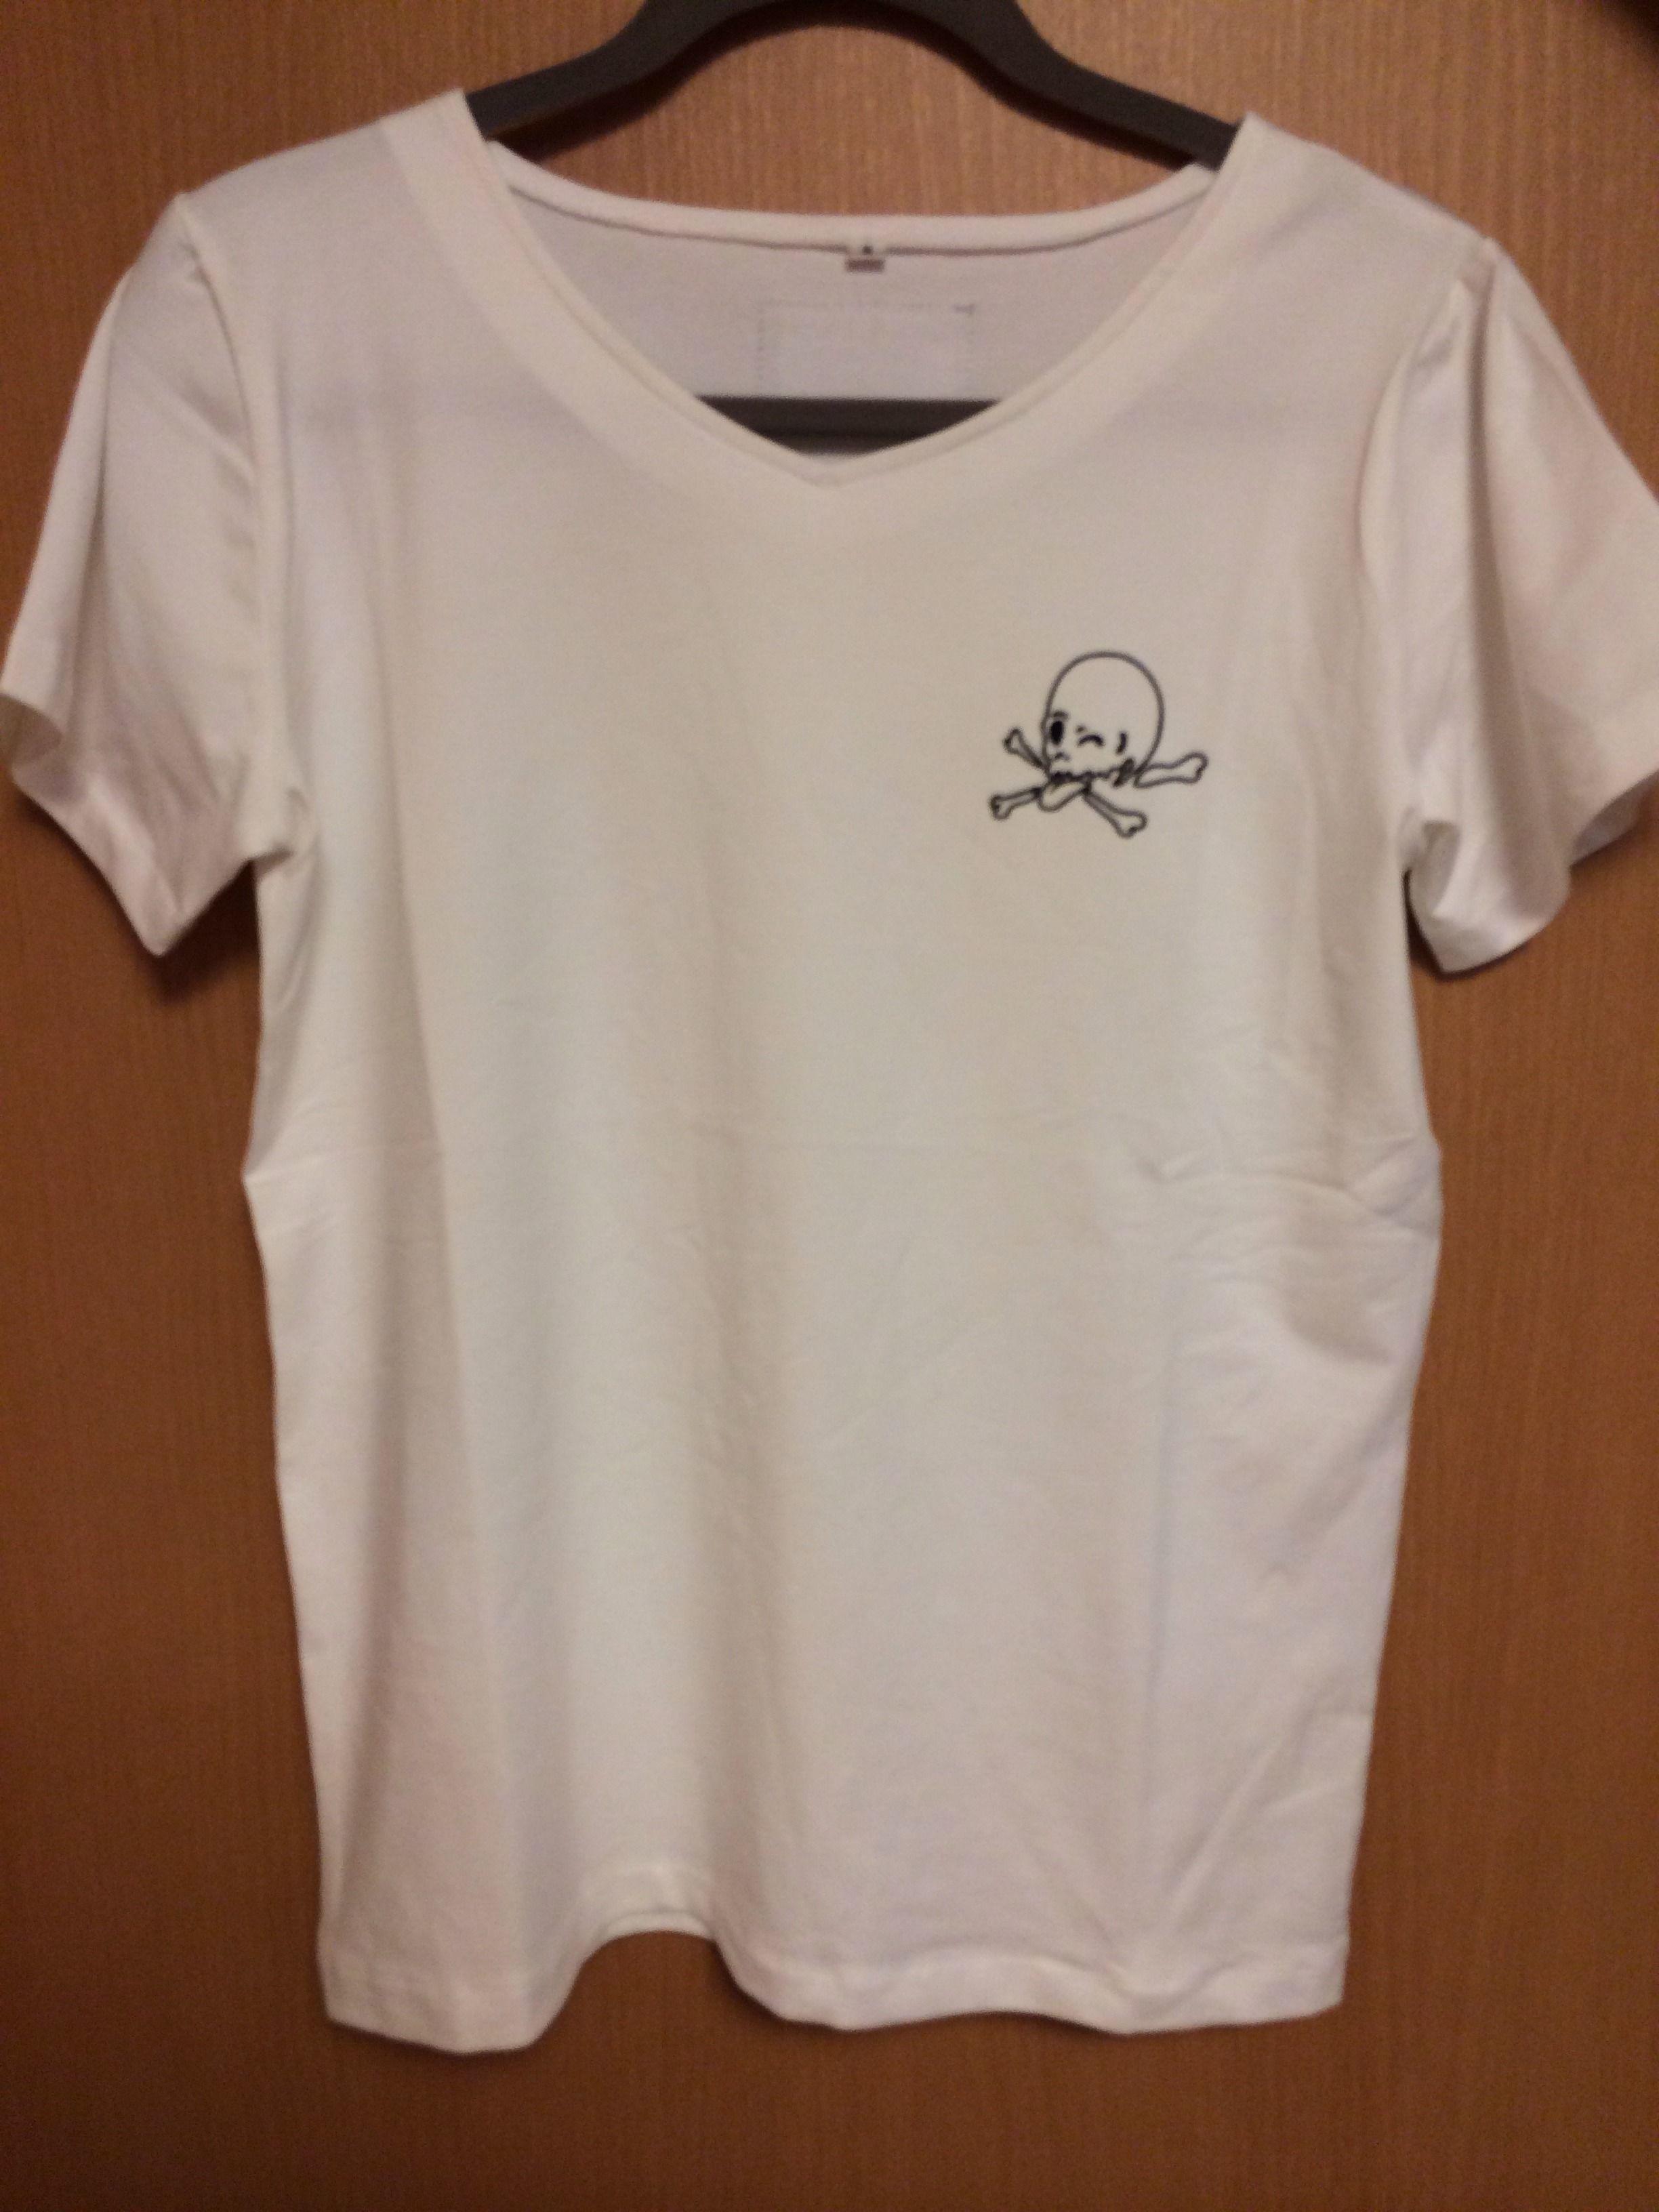 【SKULIAM】Tシャツ(White)